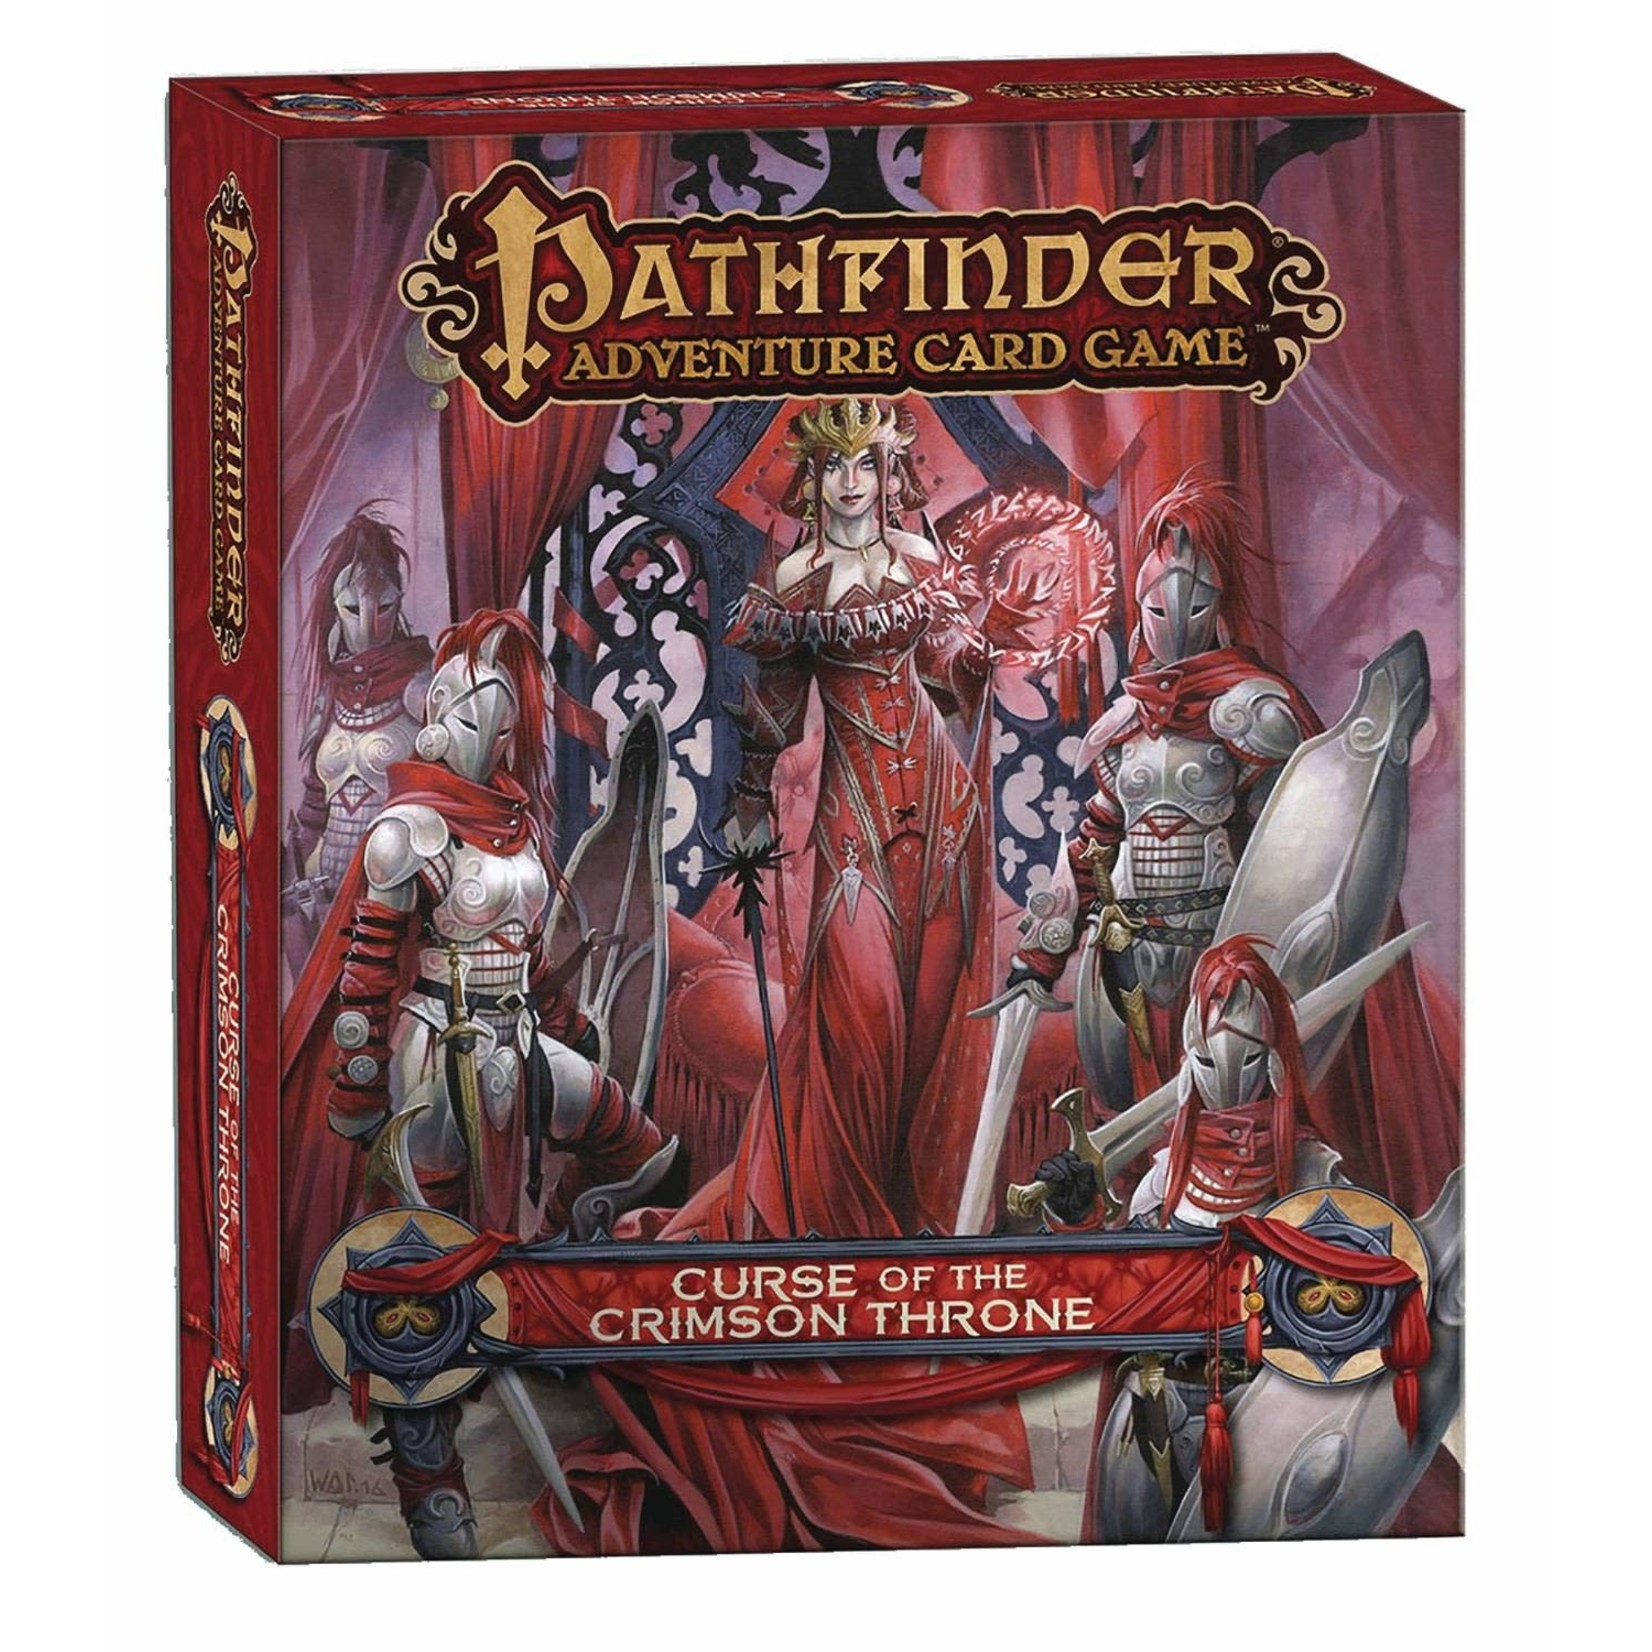 Paizo Pathfinder Adventure Card Game: Curse of the Crimson Throne Expansion